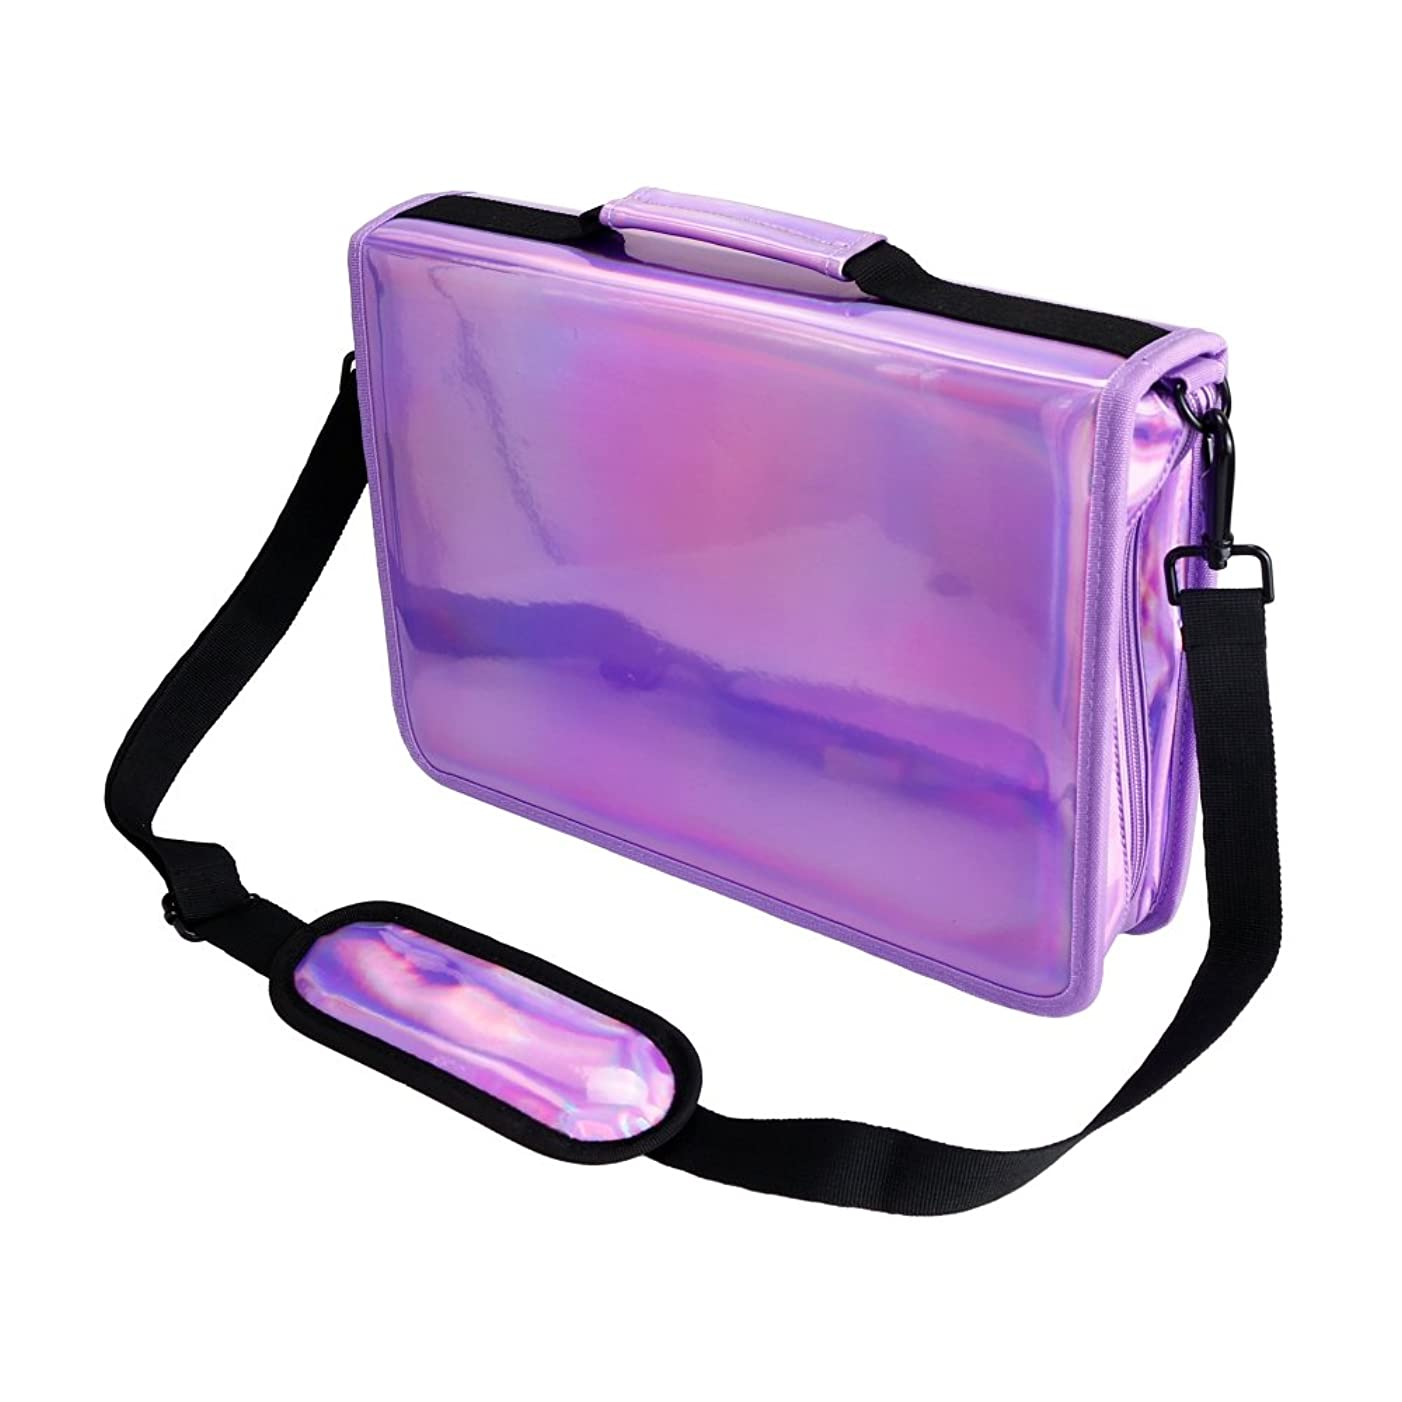 YOUSHARES 160 Slots Holographic Pencil Case - Laser PU Plating Color Large Capacity Zipper Pen Bag for Prismacolor Watercolor Pencils, Crayola Colored Pencils, Marco Pens & Cosmetic Brush (Purple)